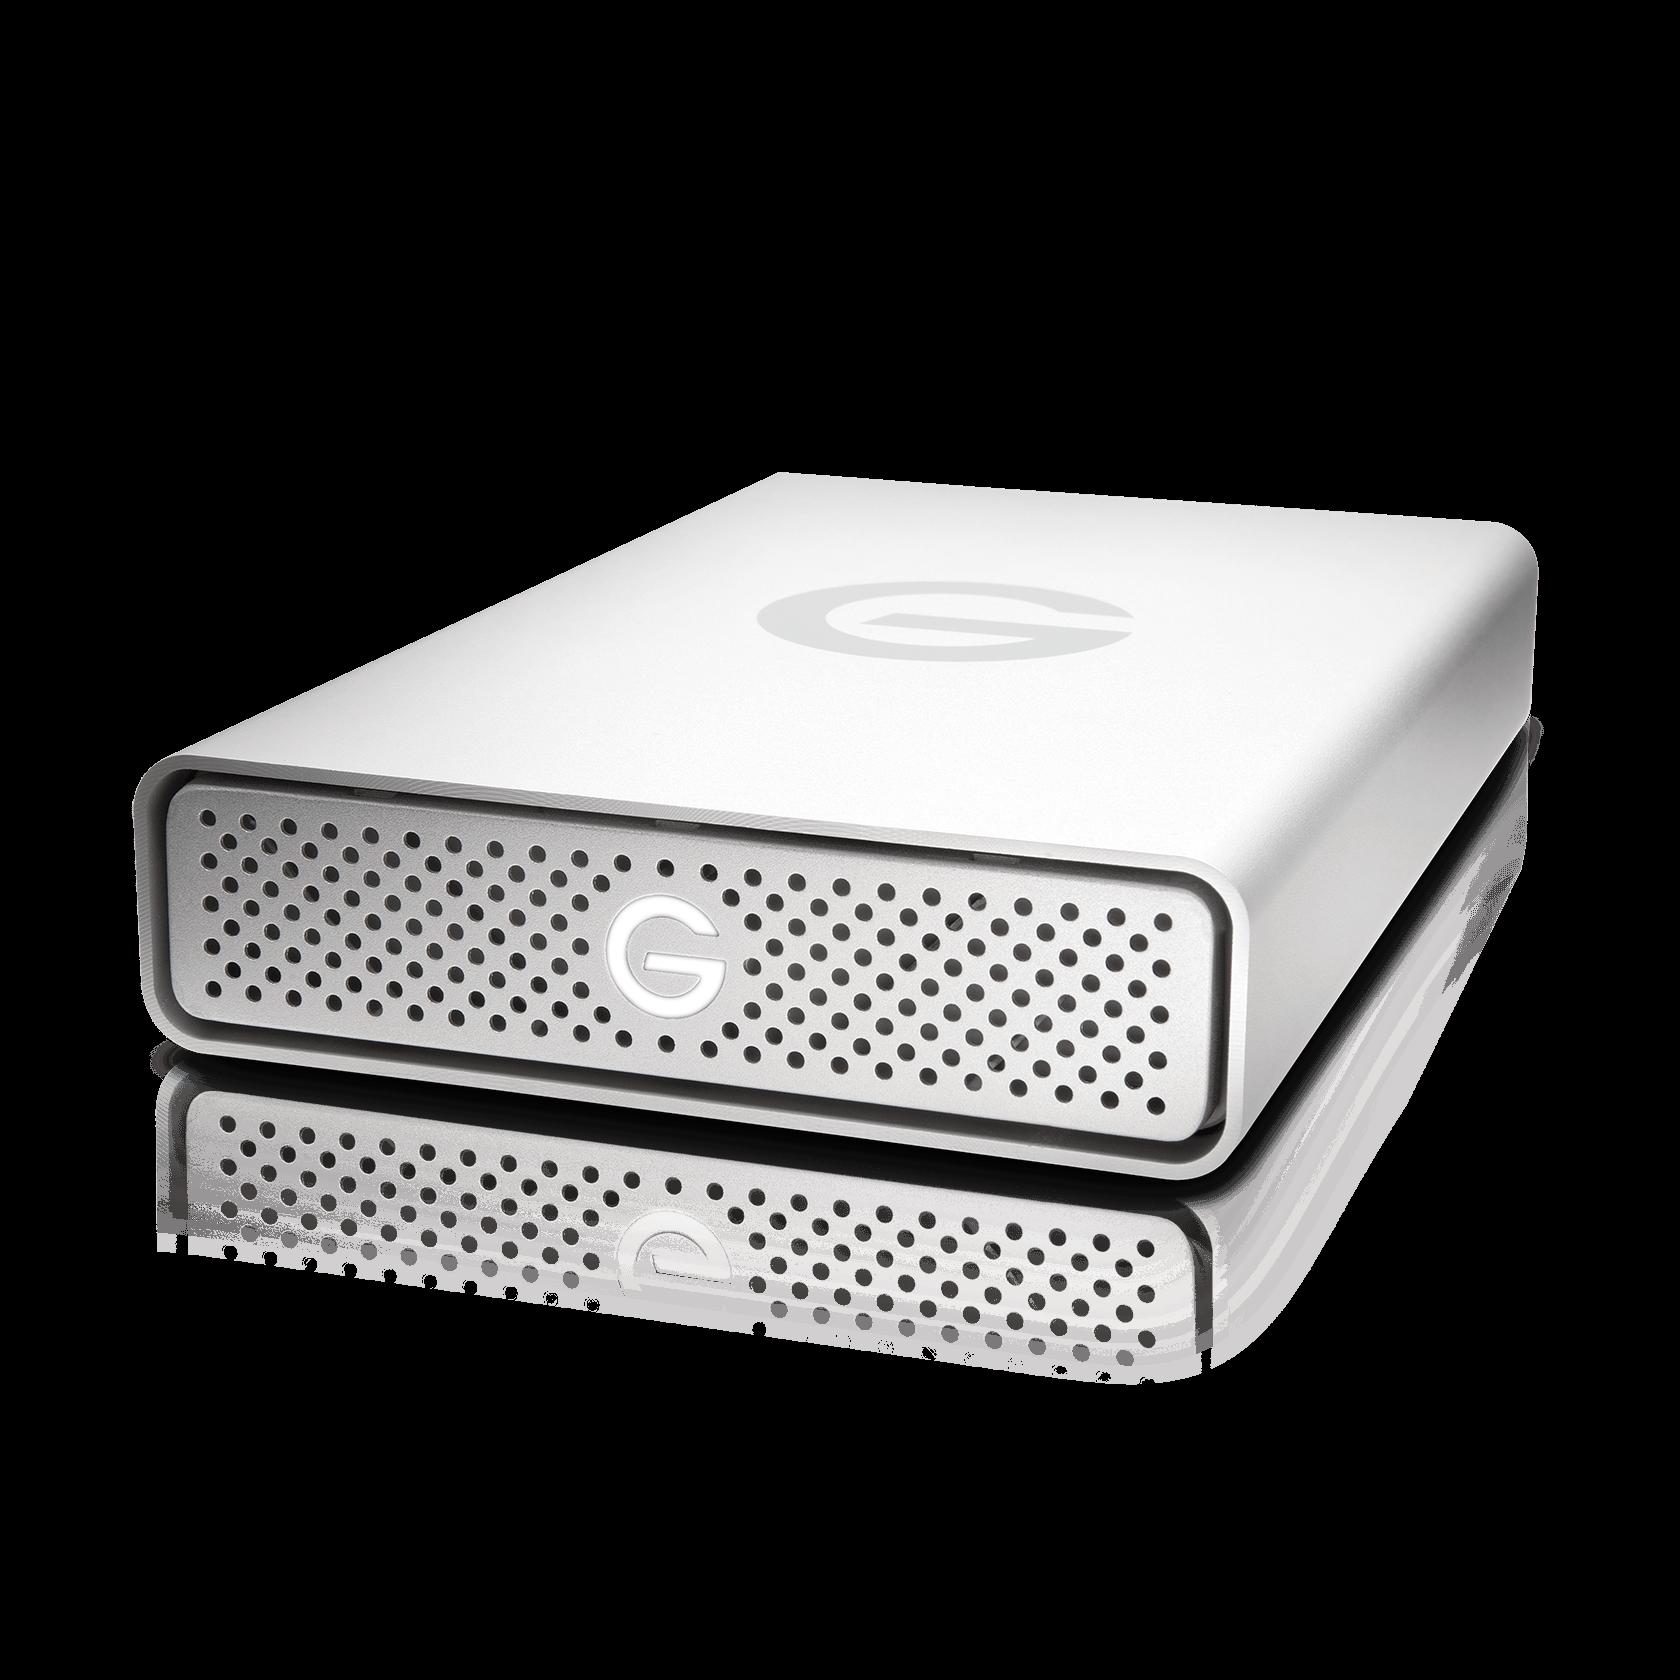 WesternDigital coupon: G-Technology 4TB G-DRIVE USB - 0G03594-1